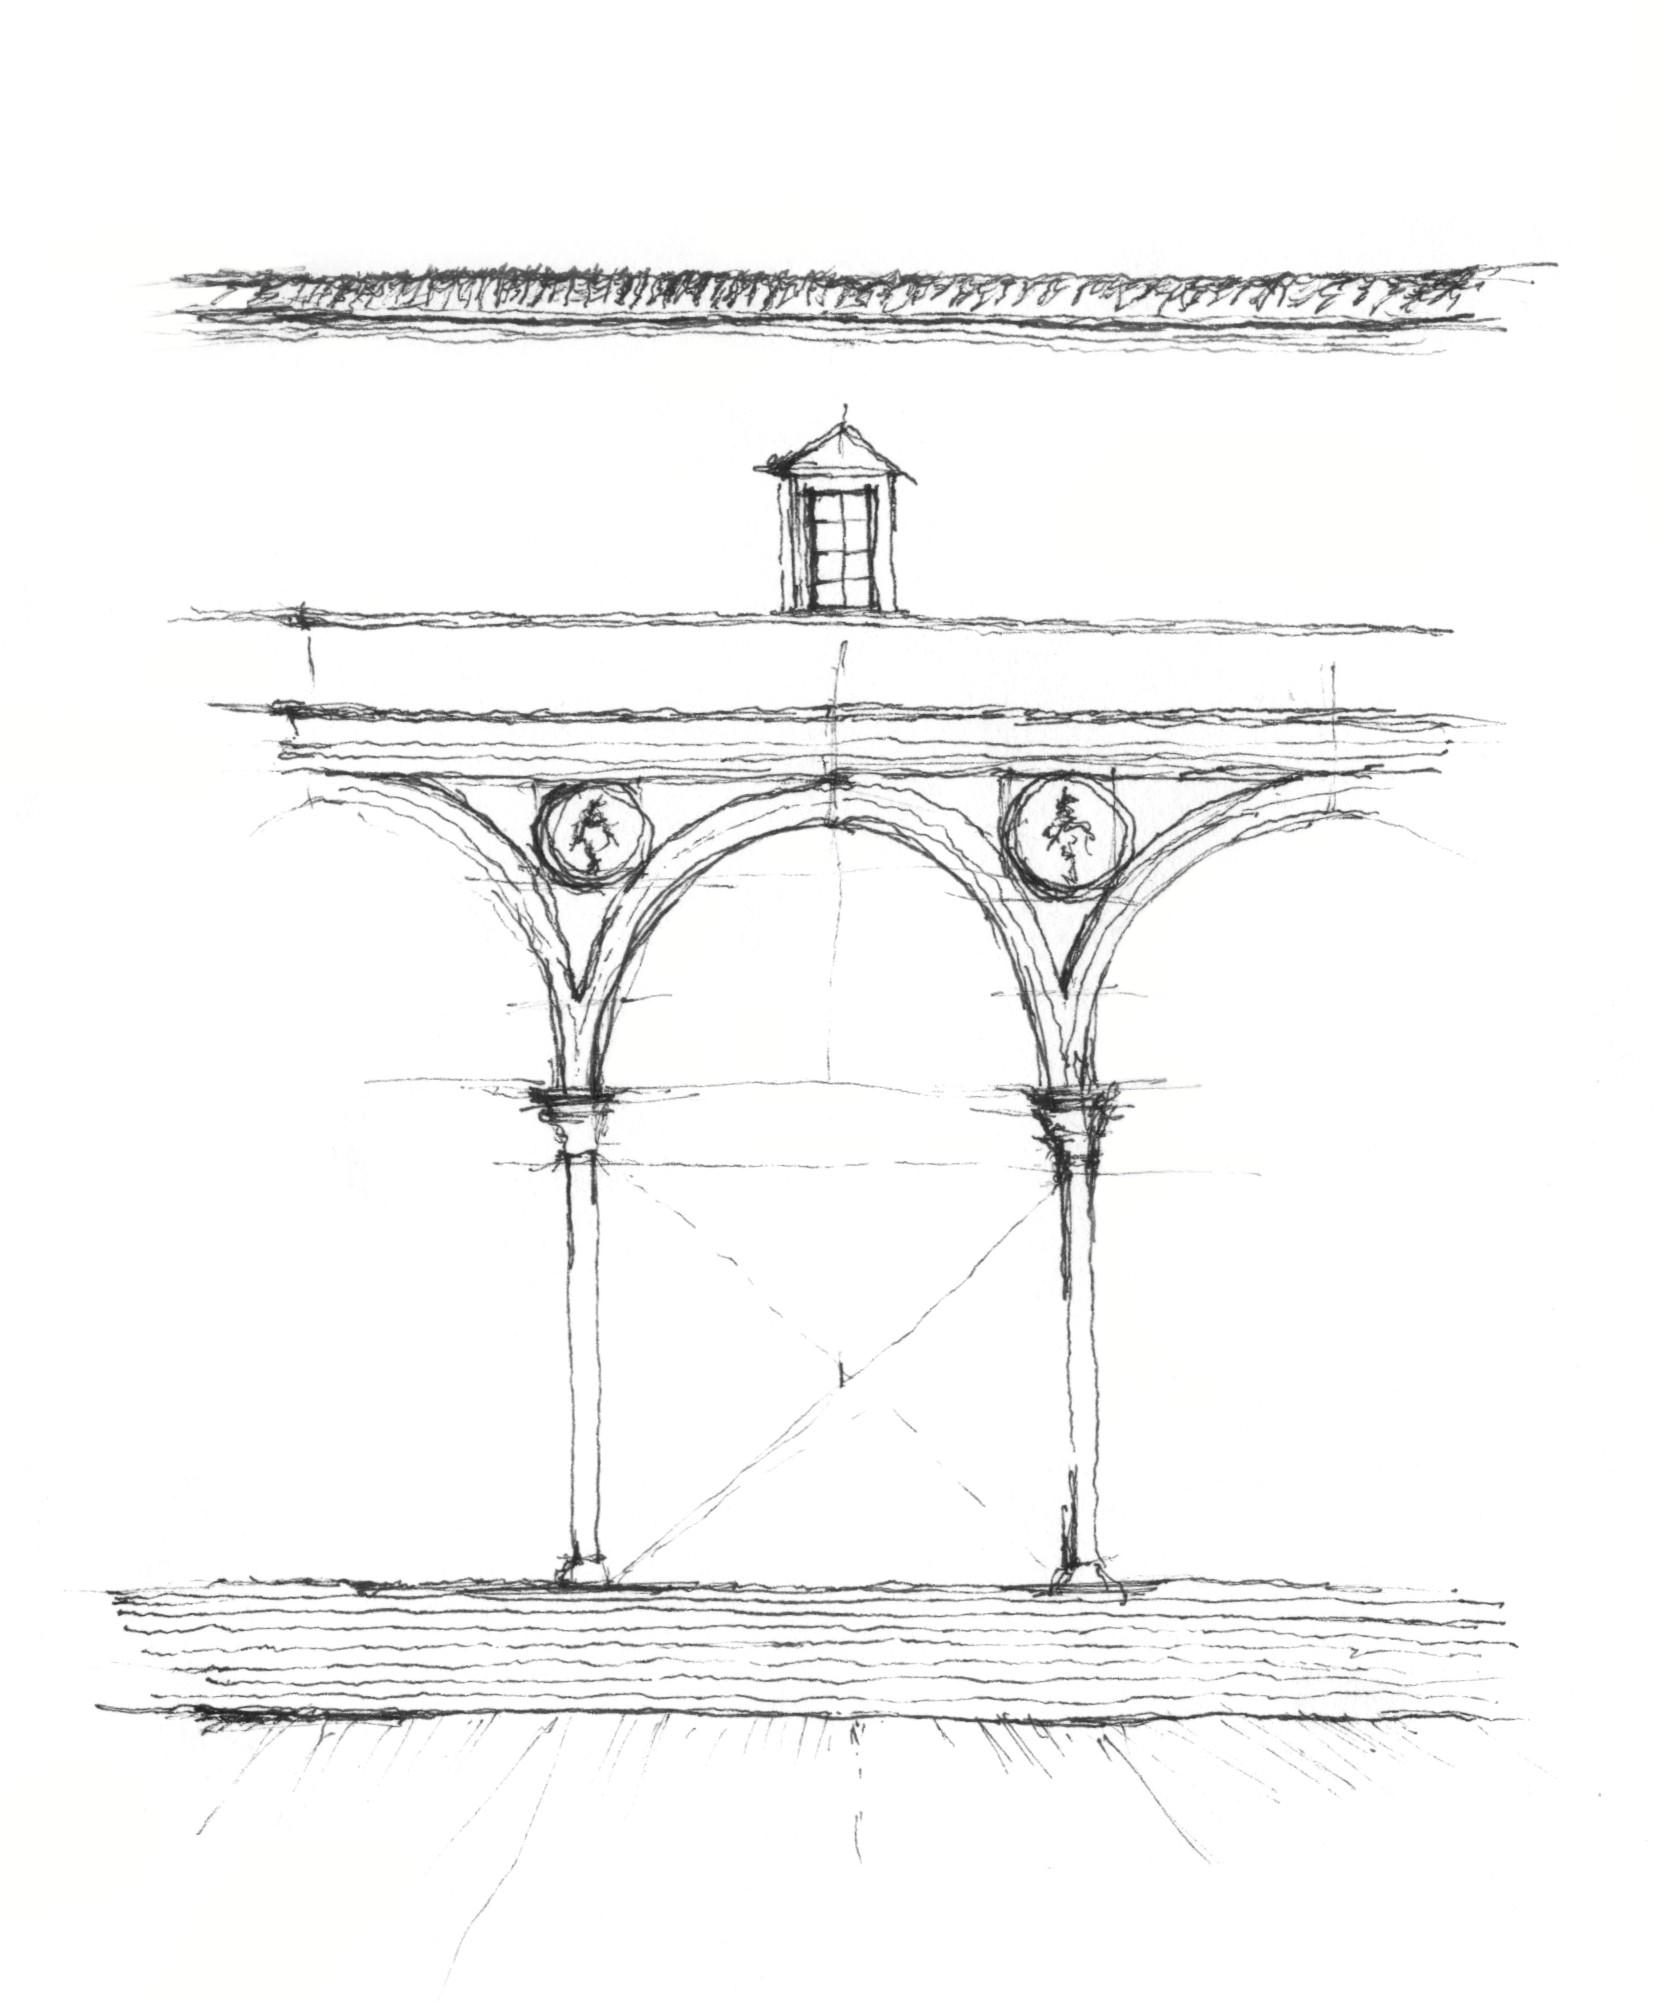 Piazza S Annunziata